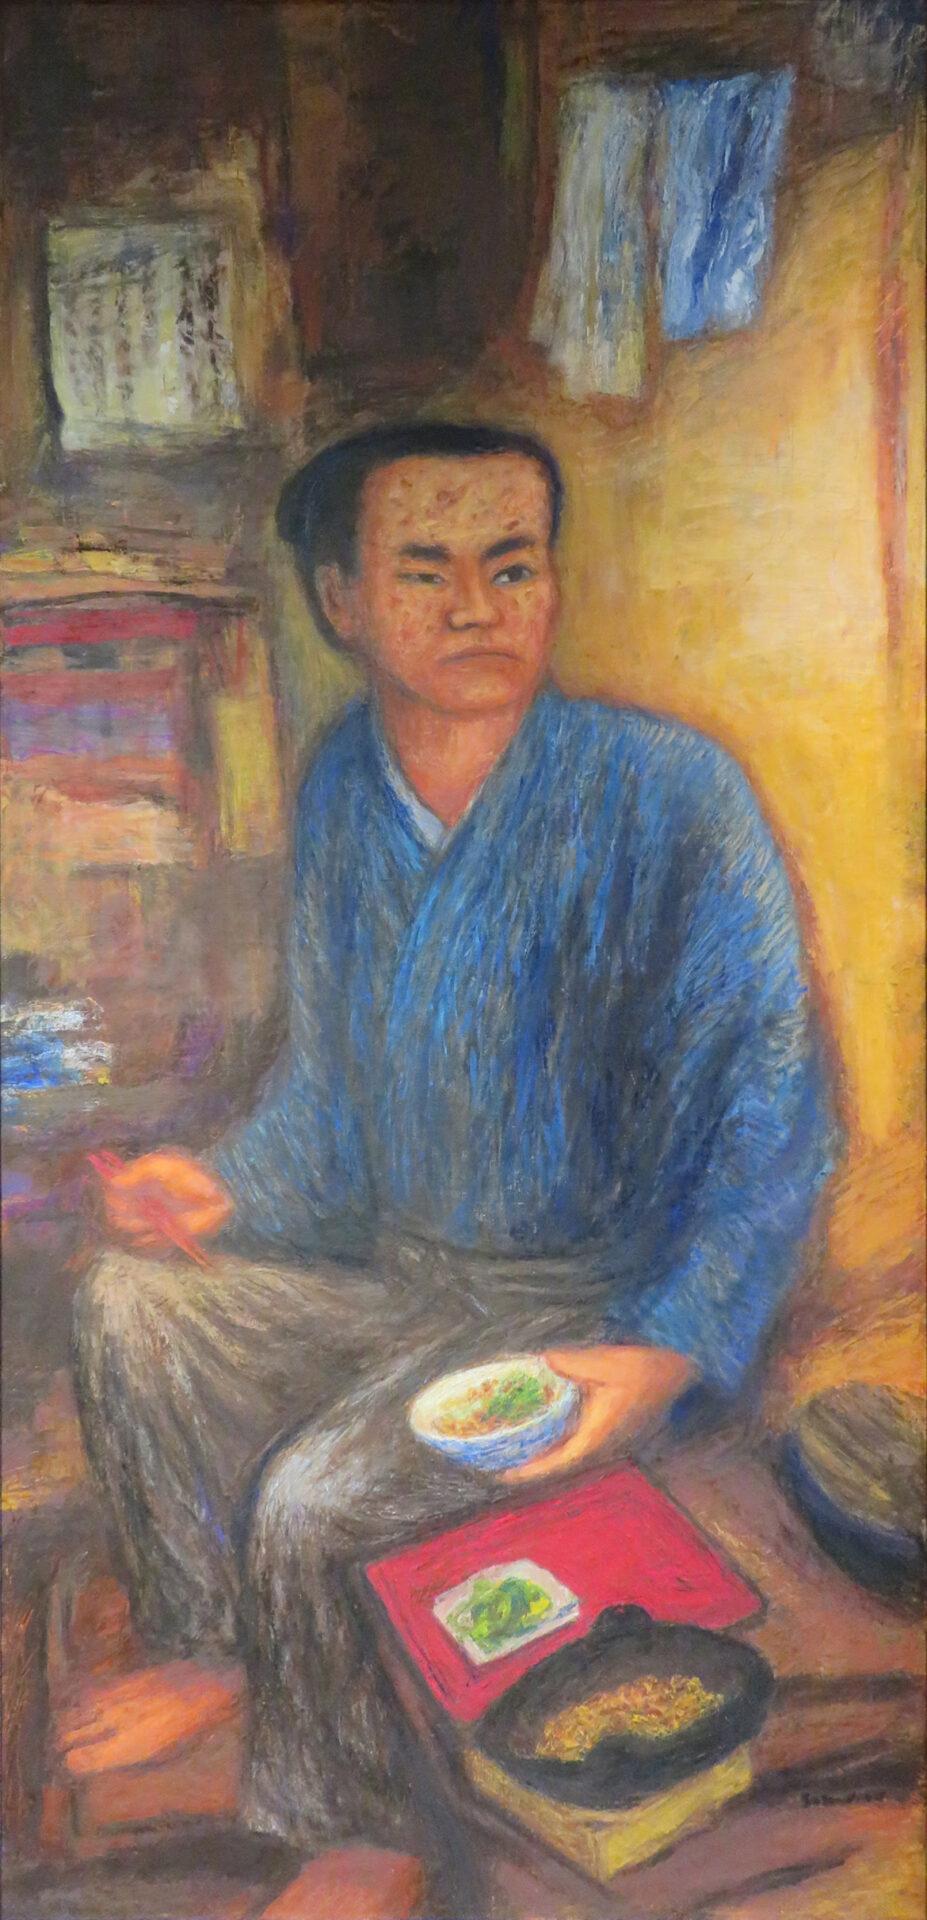 Yasui Sokken eats in the name of Chuhei beans. (22 years old)